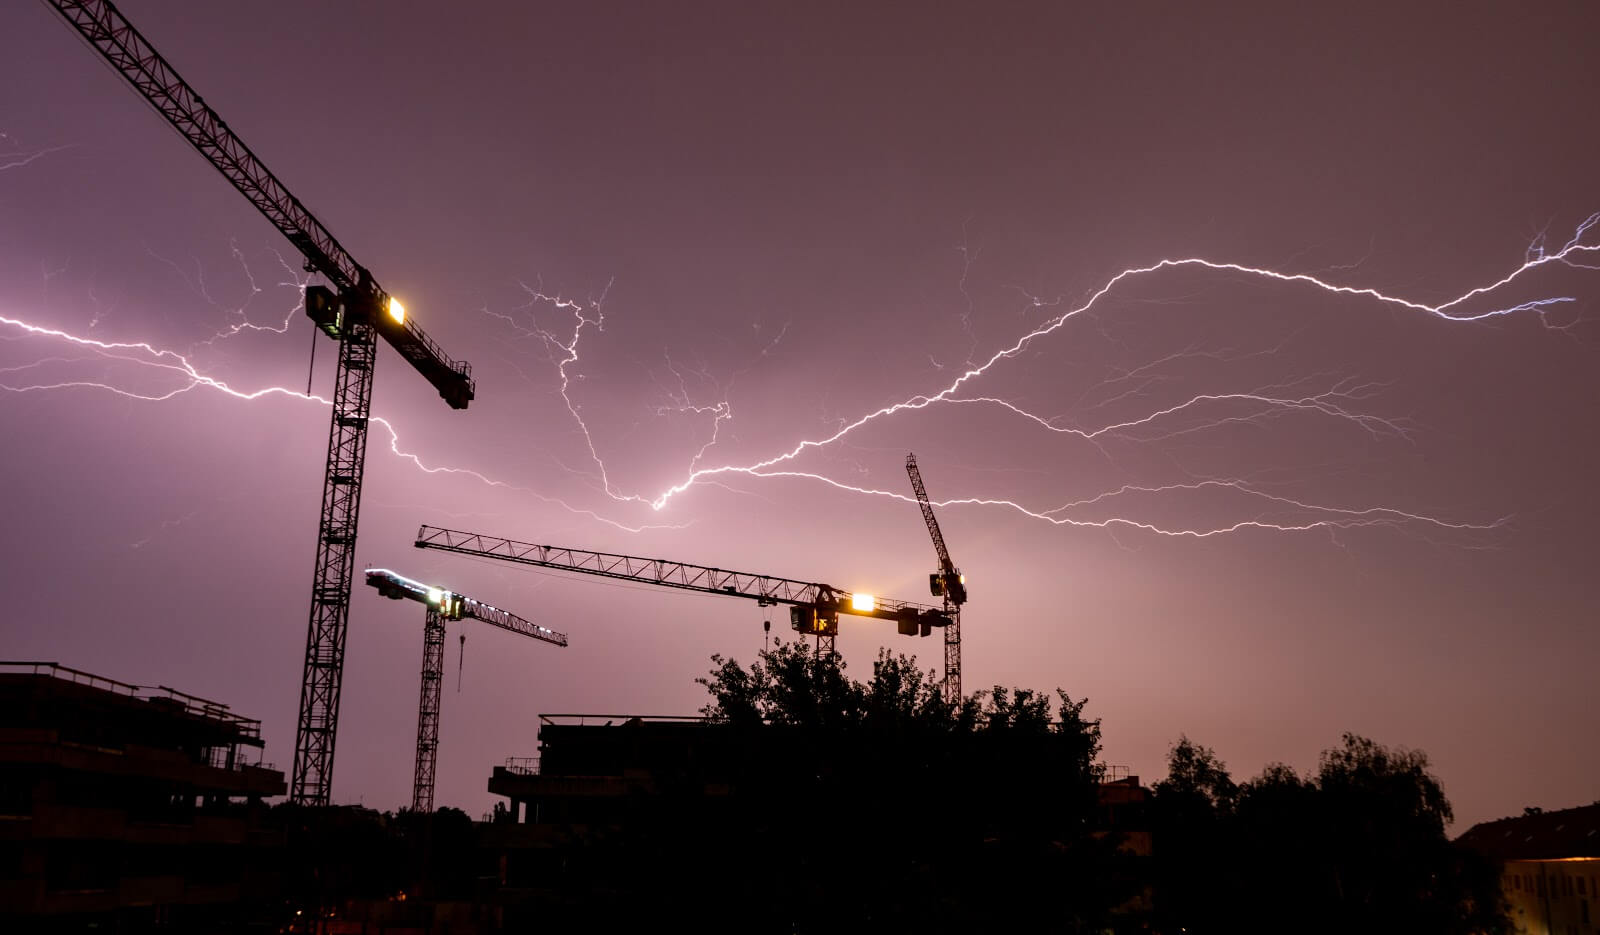 lightning in construction sites